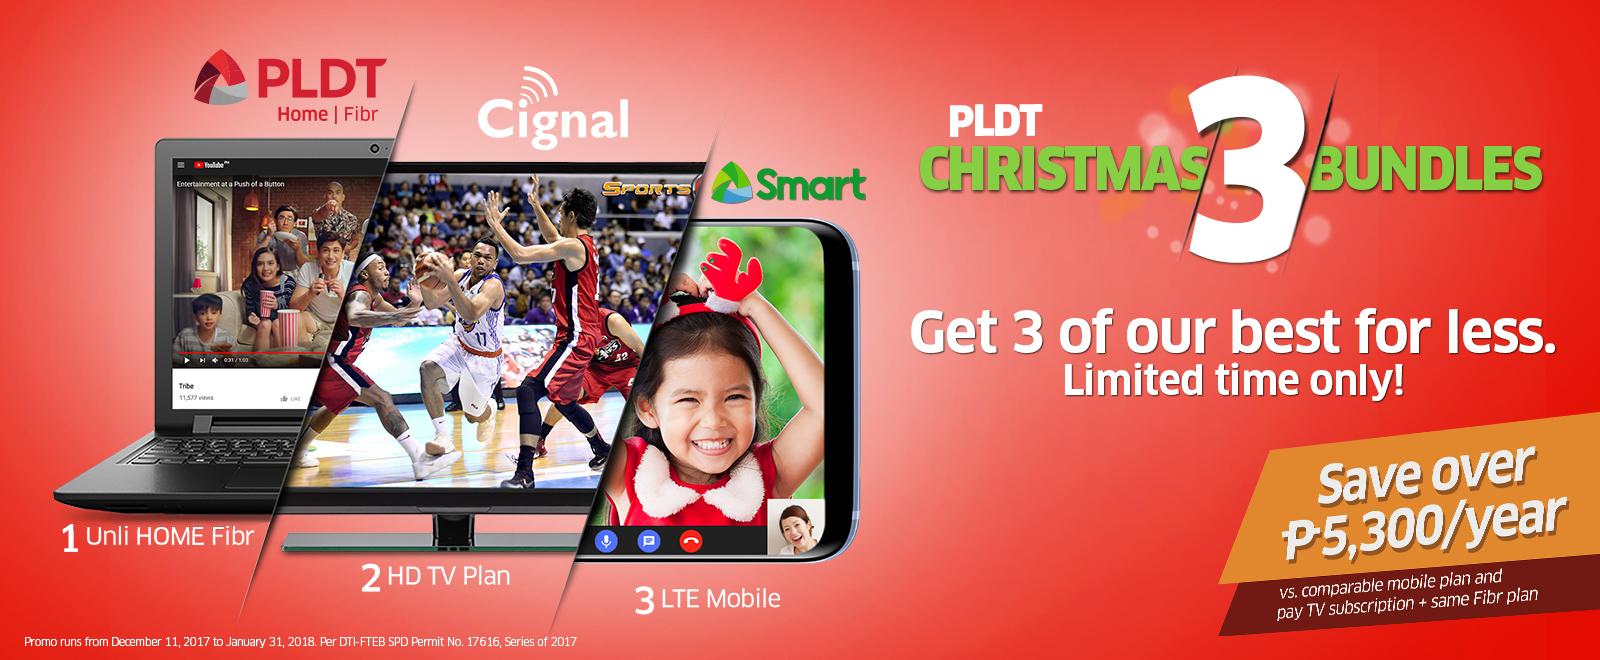 PLDT Christmas 3 Bundle Promo